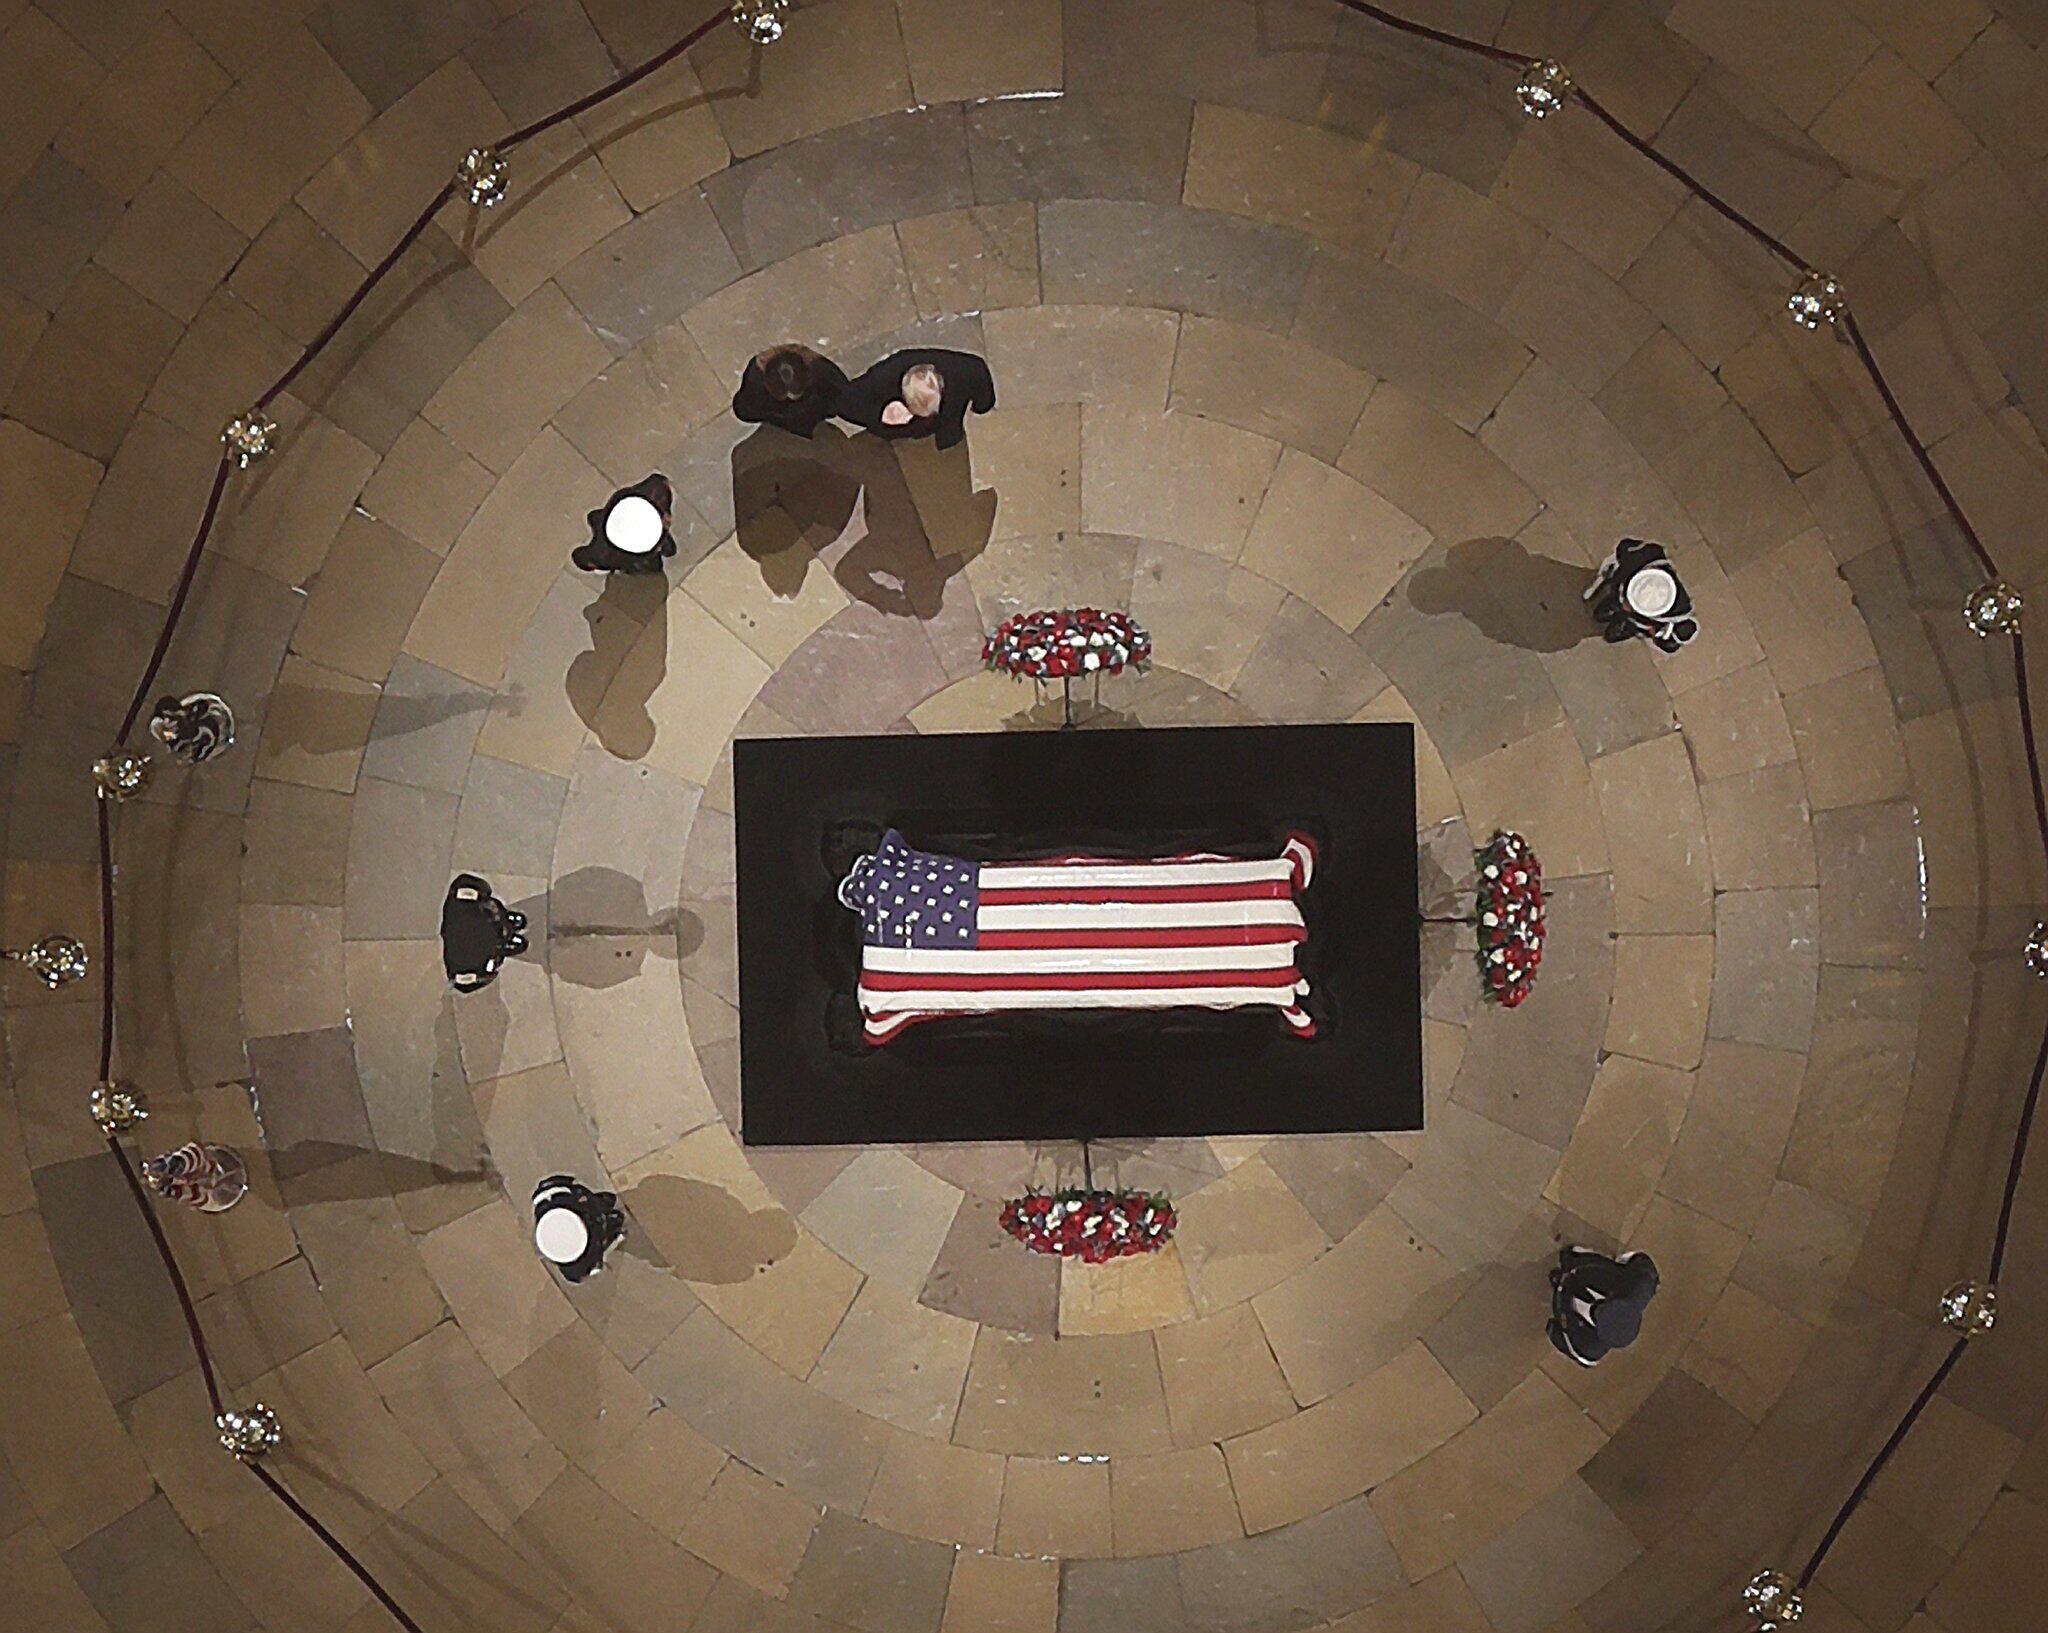 Bild zu Vor dem Staatsbegräbnis des ehemaligen US-Präsidenten Bush